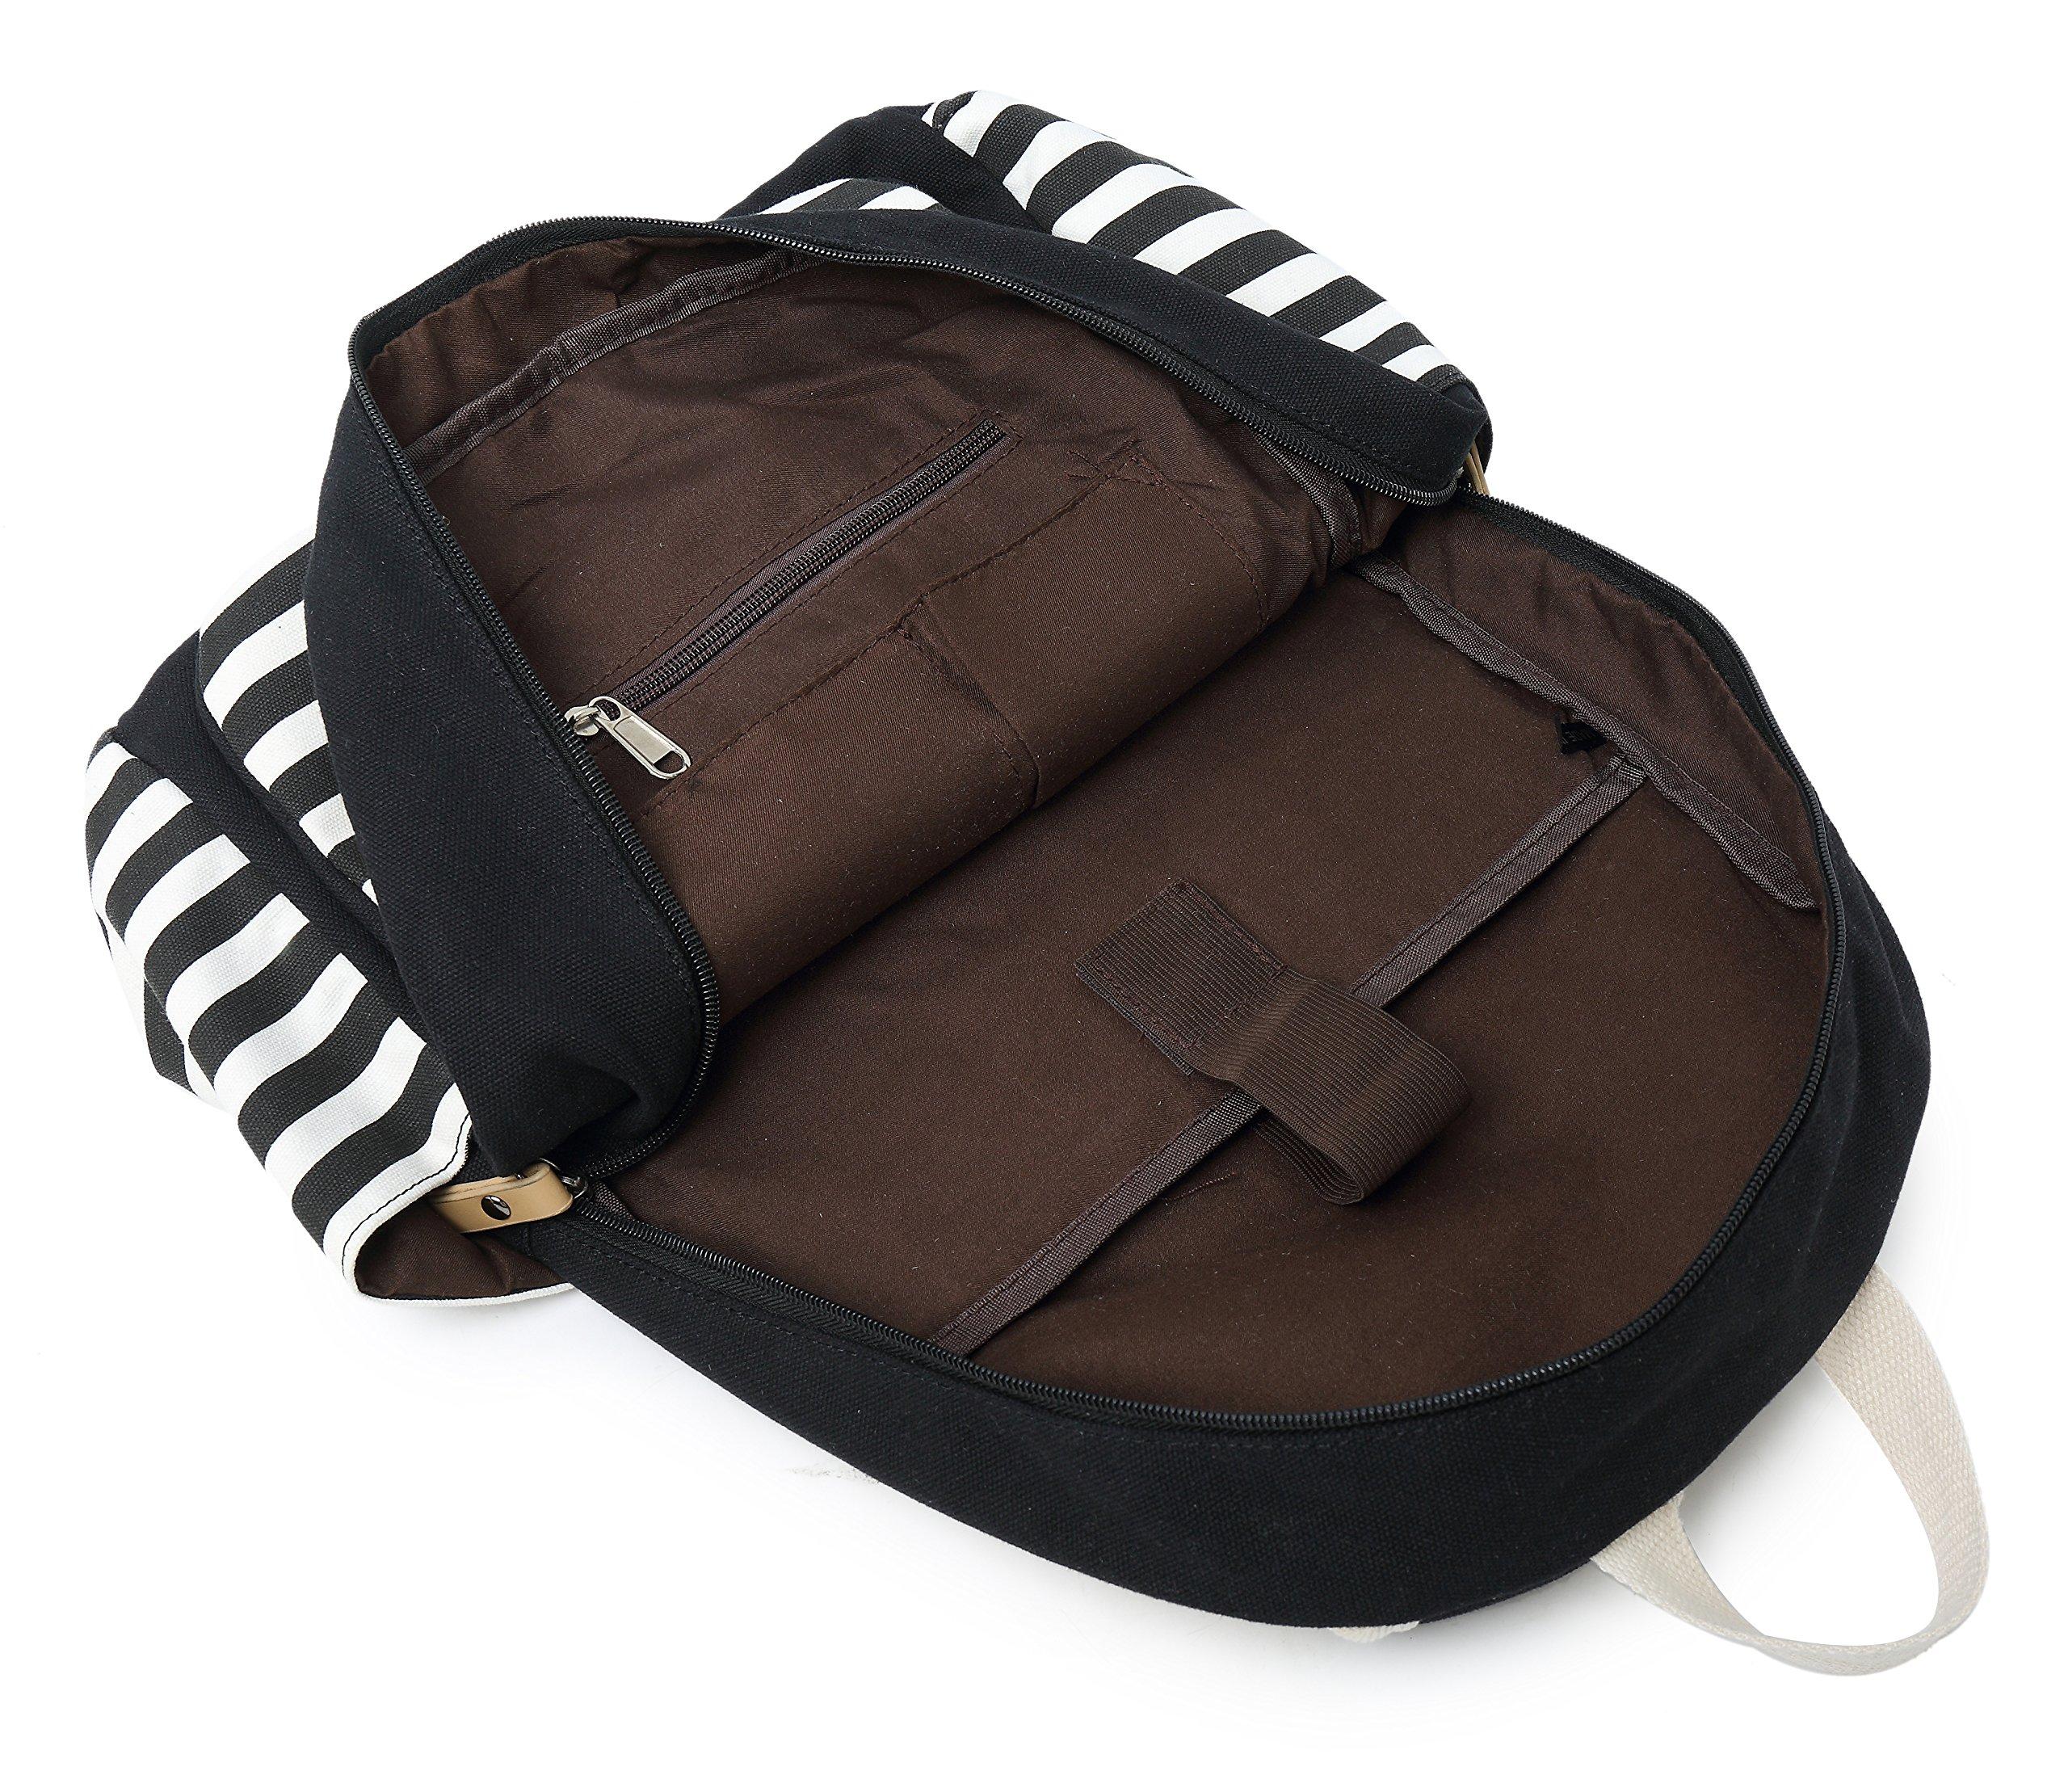 School Backpack for Girls, Gazigo Womens High School College Bookbags Laptop Bag (Black) by Gazigo (Image #6)